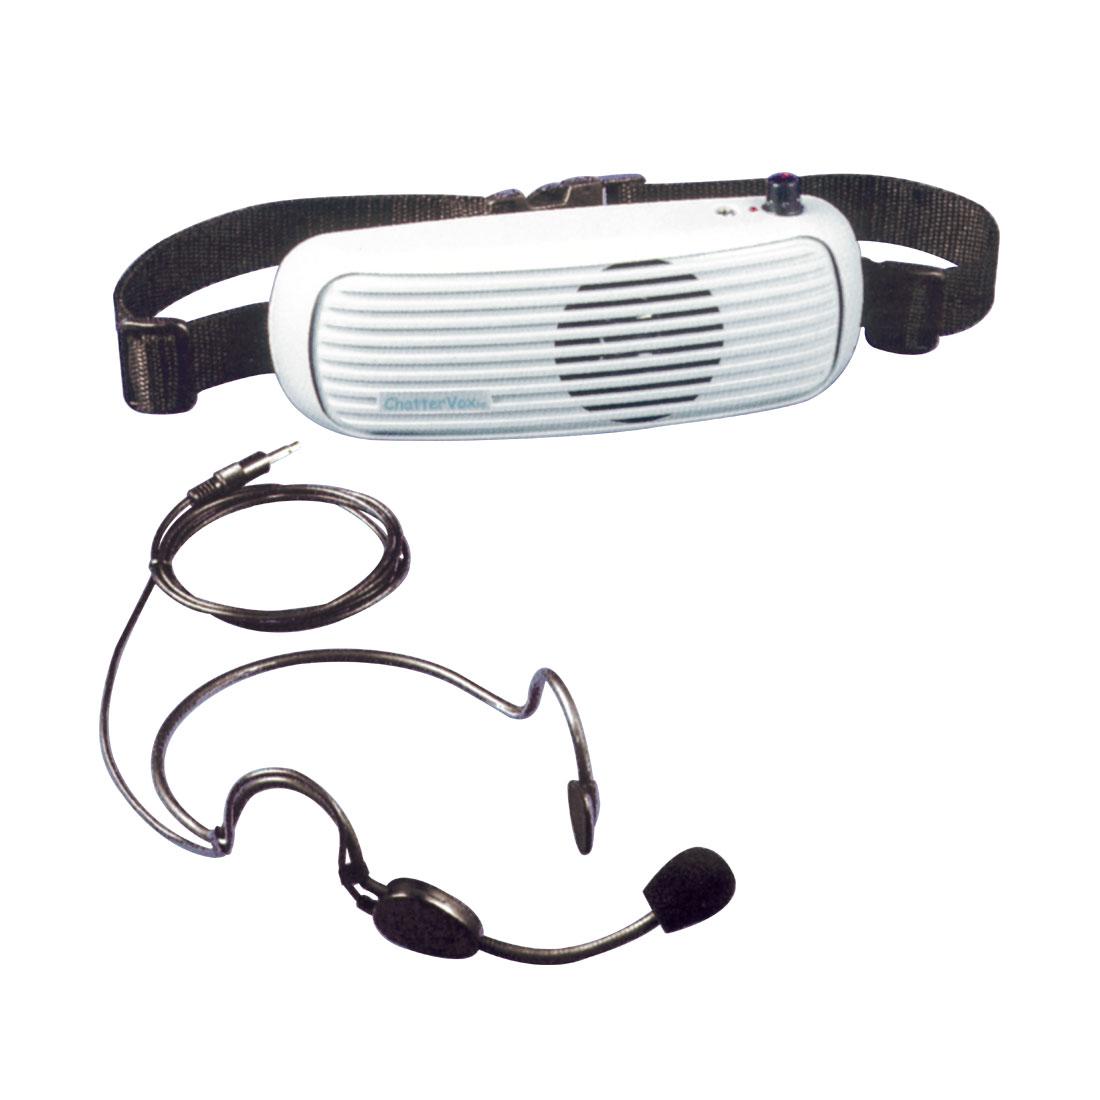 Chattervox Voice Amplifier Price: $248.75